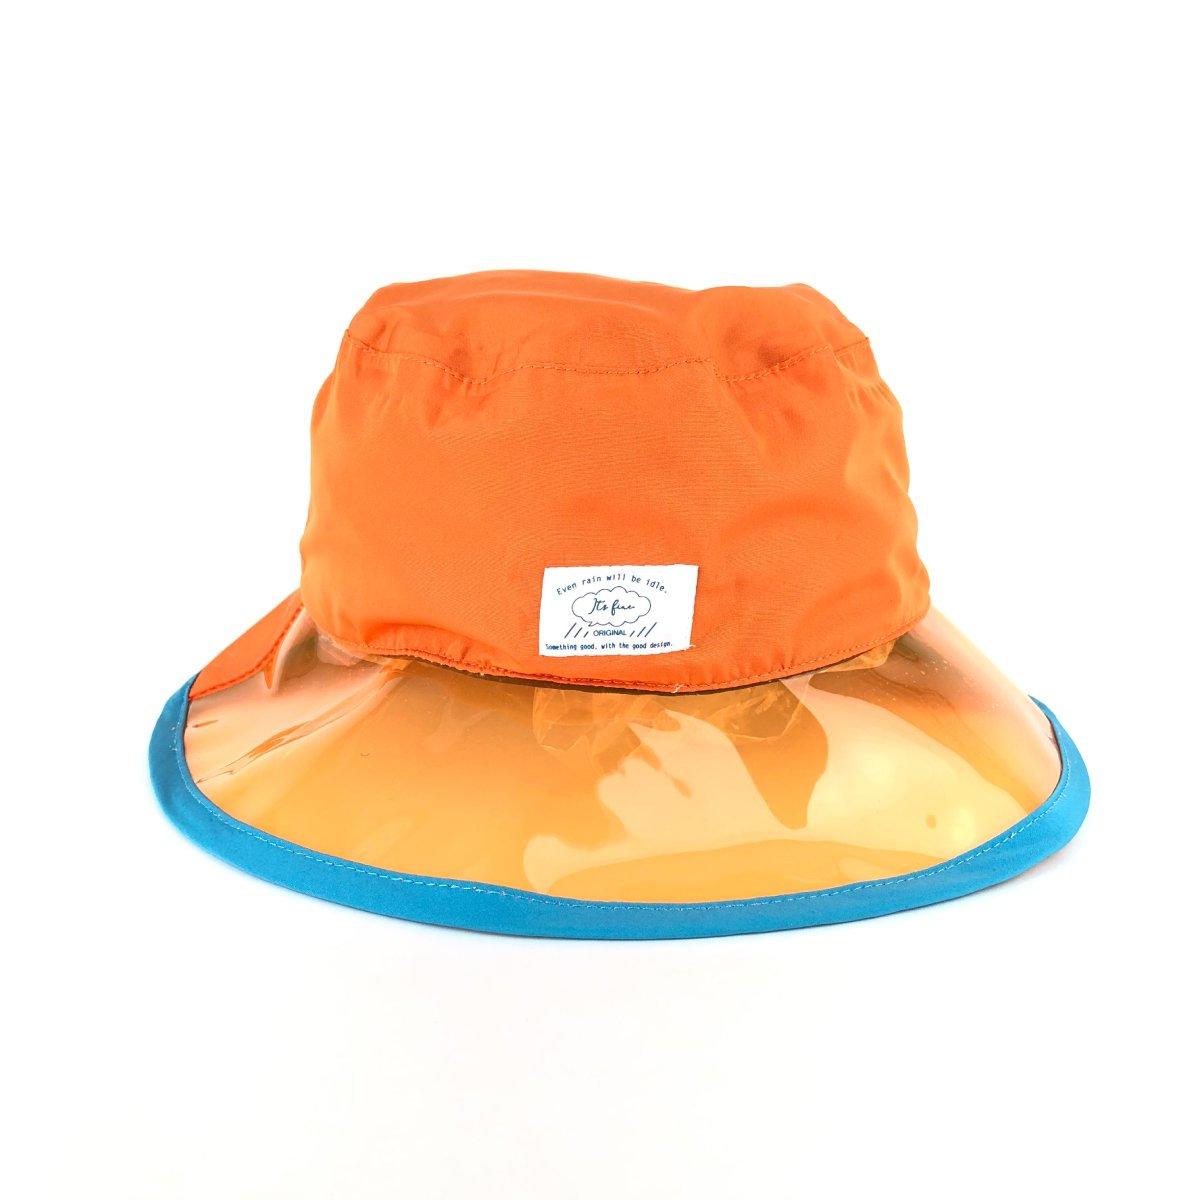 【BABY】Baby Rain PVC Hat 詳細画像3